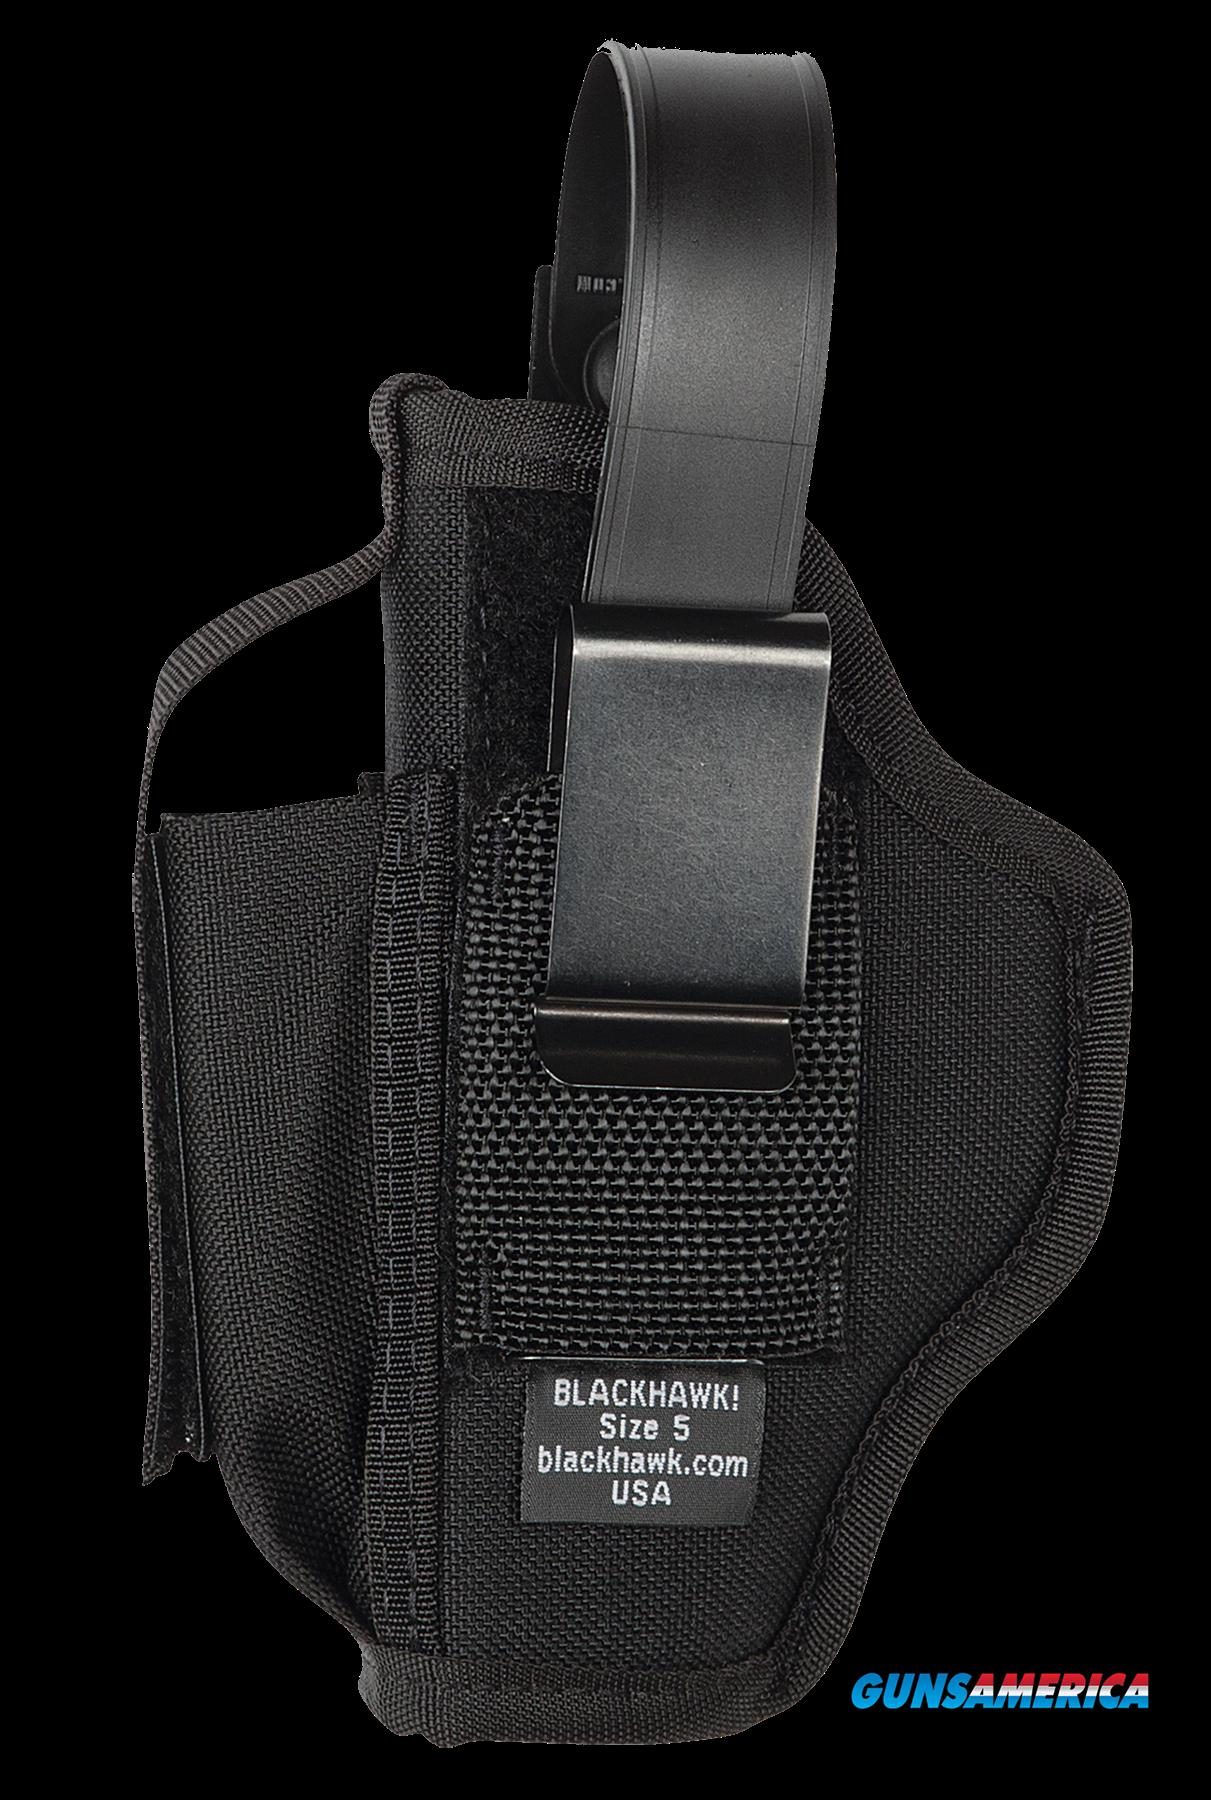 Blackhawk Multi-use, Bhwk 40am02bk  Ambi Holster Sz 2  Guns > Pistols > 1911 Pistol Copies (non-Colt)